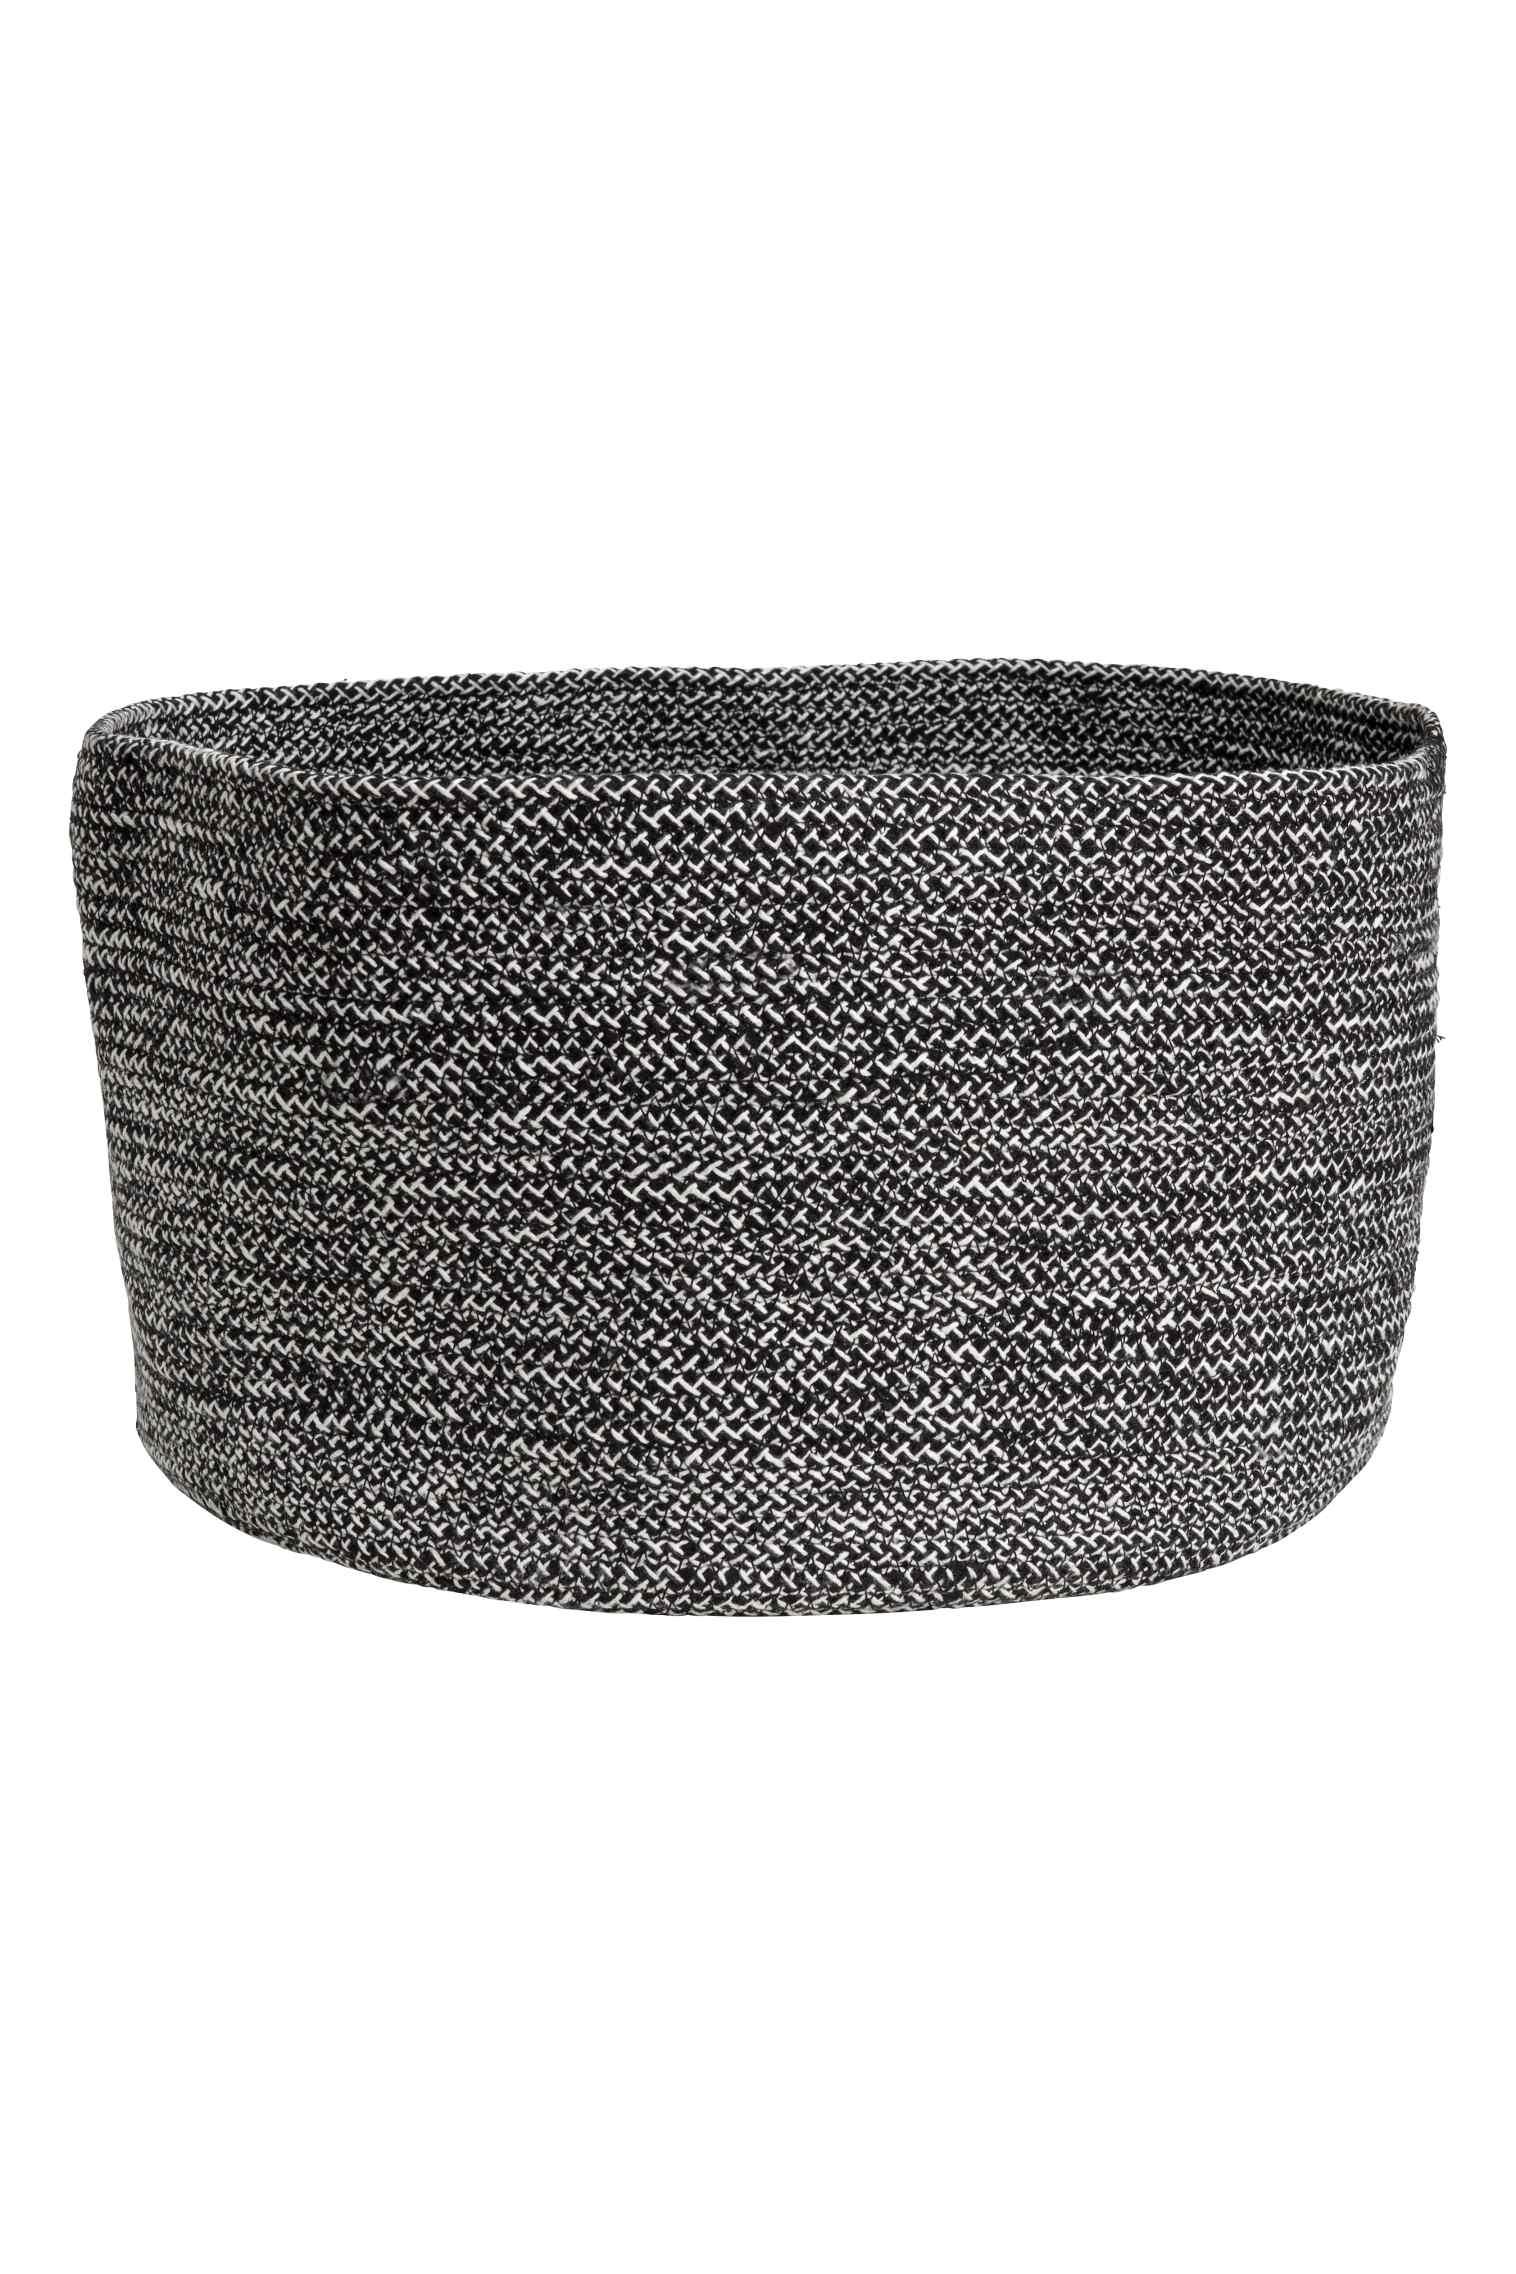 Large cotton basket, $30